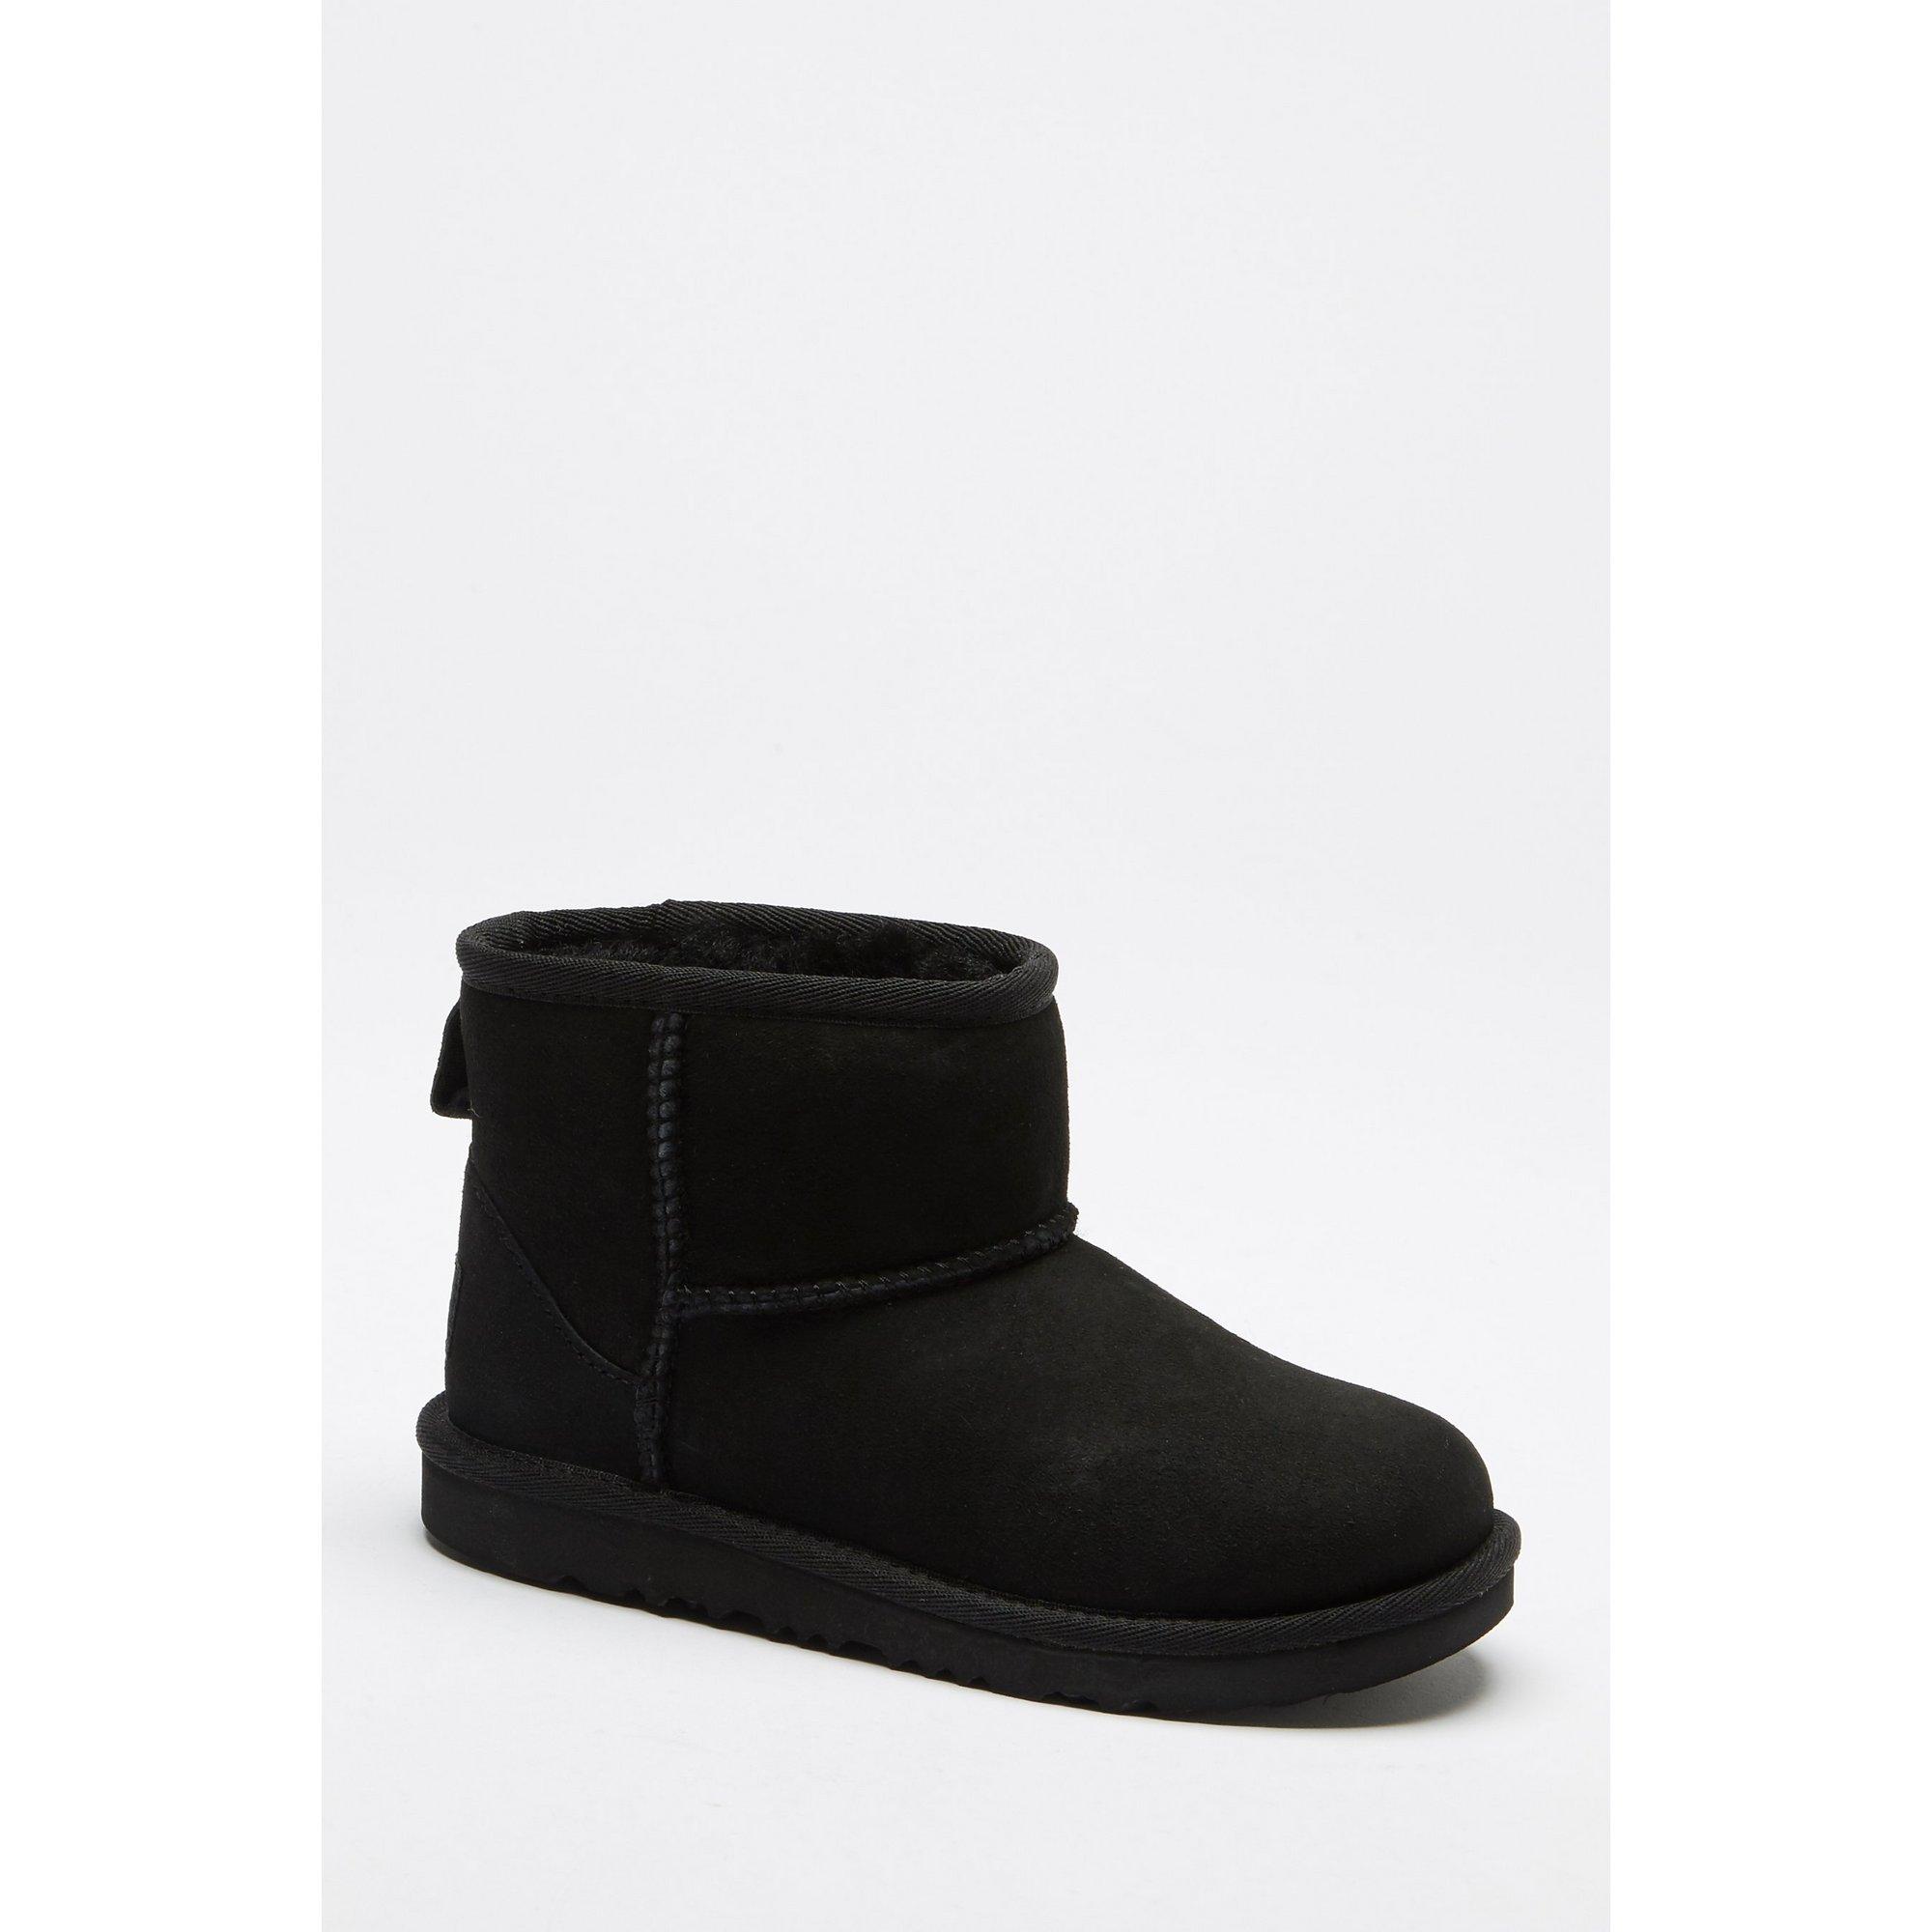 Image of UGG Classic 2 Mini Boots